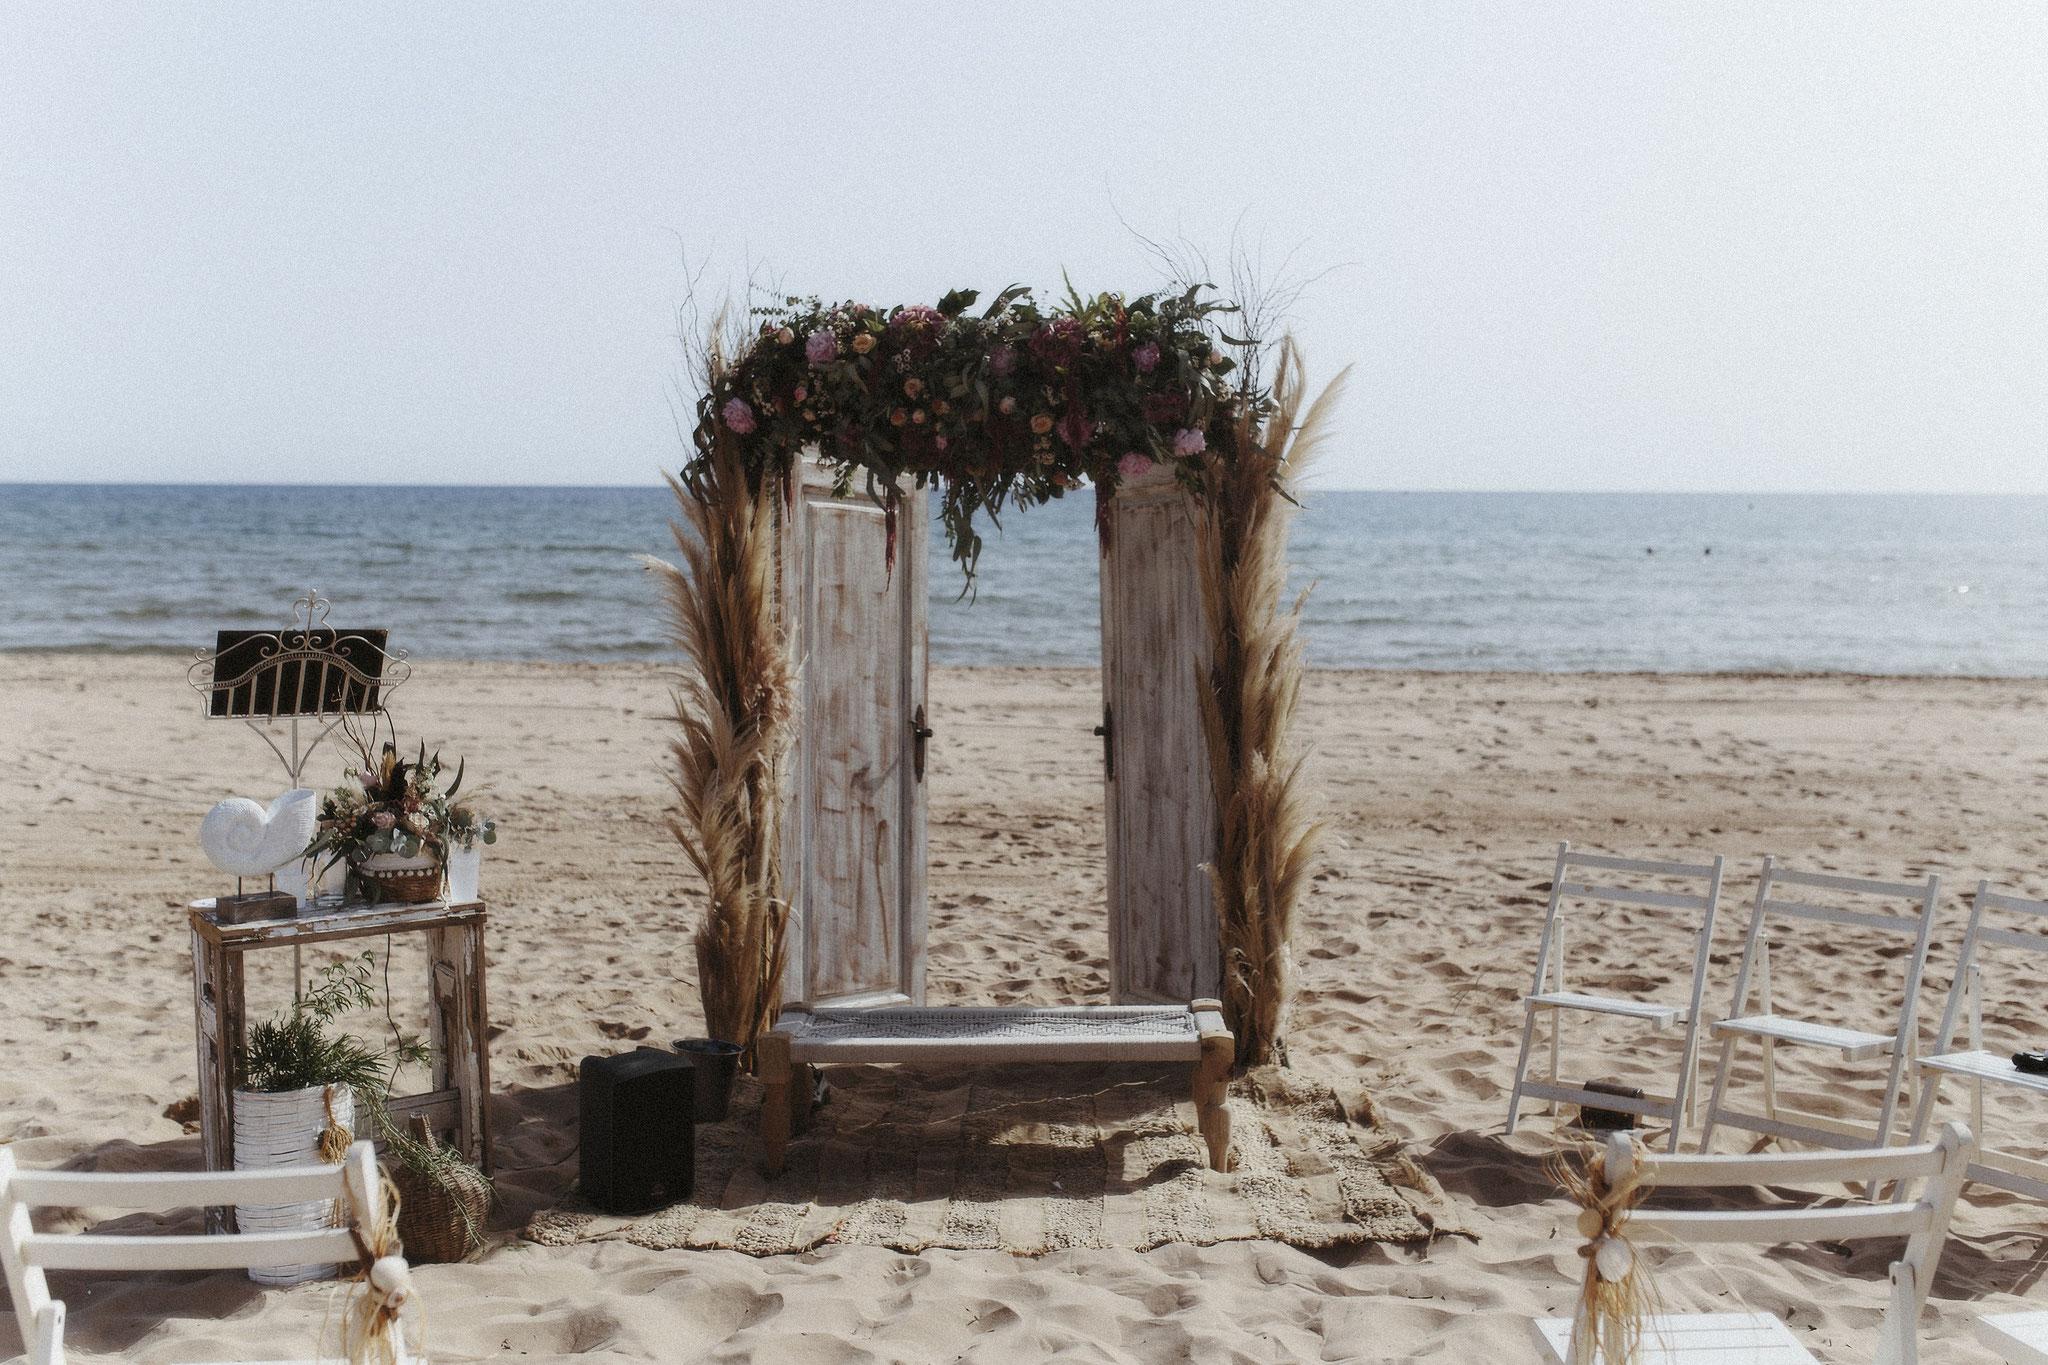 Vor dem Tor zum Meer soll die Zeremonie abgehalten werden (Foto: Revela't)